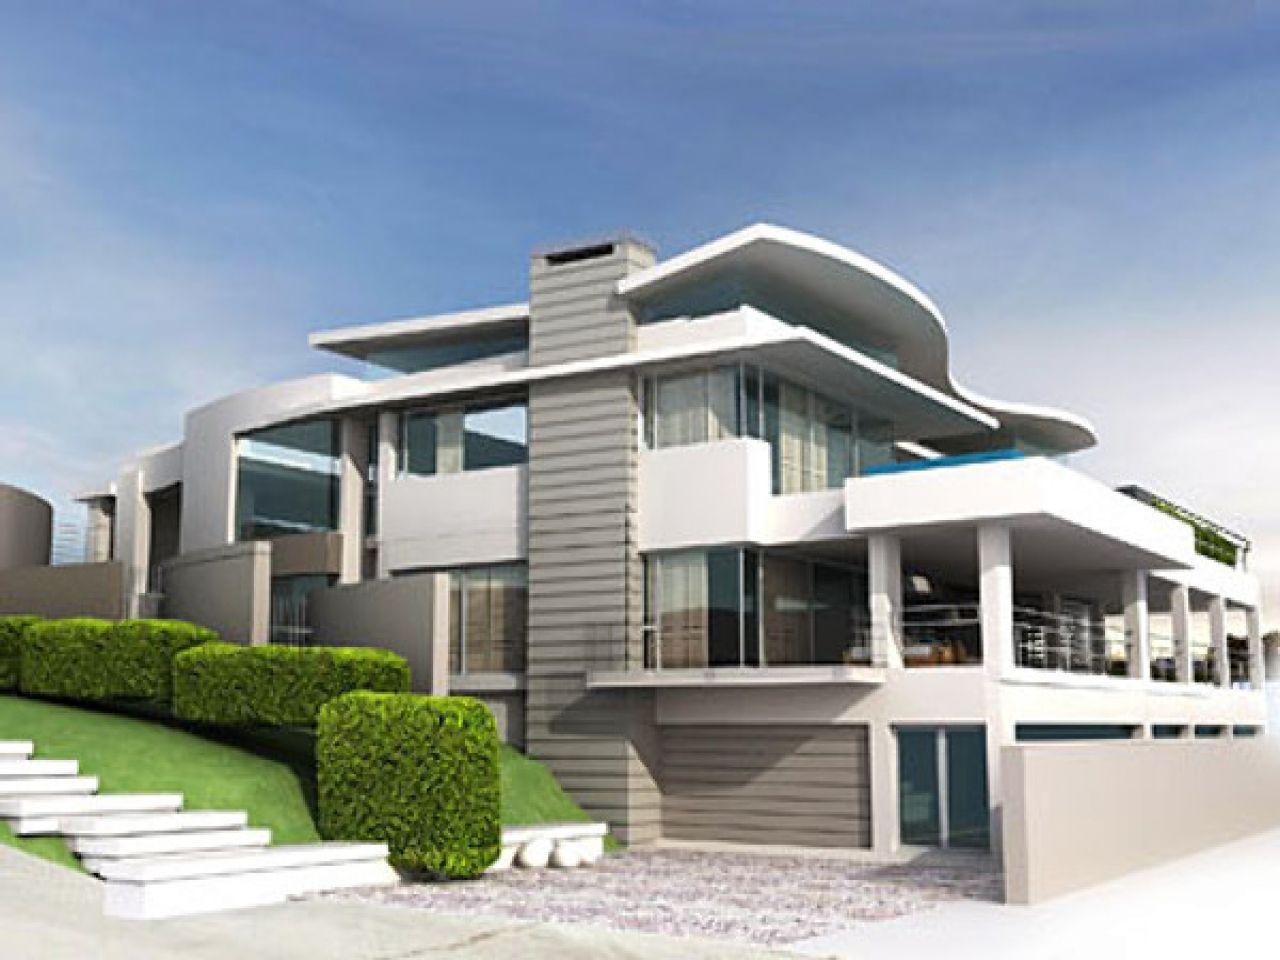 Beach House Model 3d Modern Beach House House 3d Model Model Homes